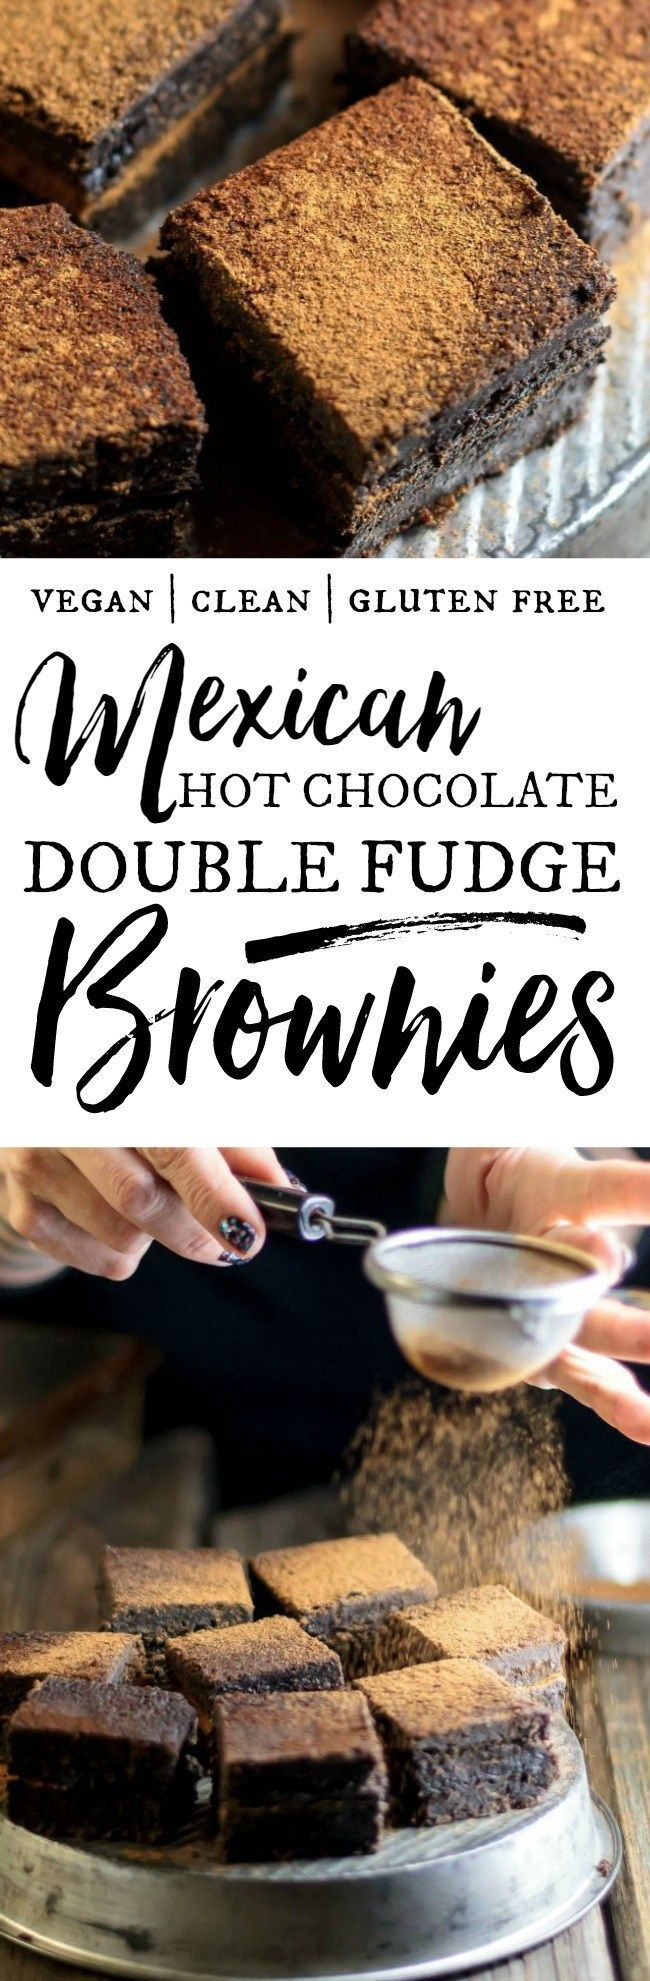 Mexican Hot Chocolate Double Fudge Brownies   https://lomejordelaweb.es/